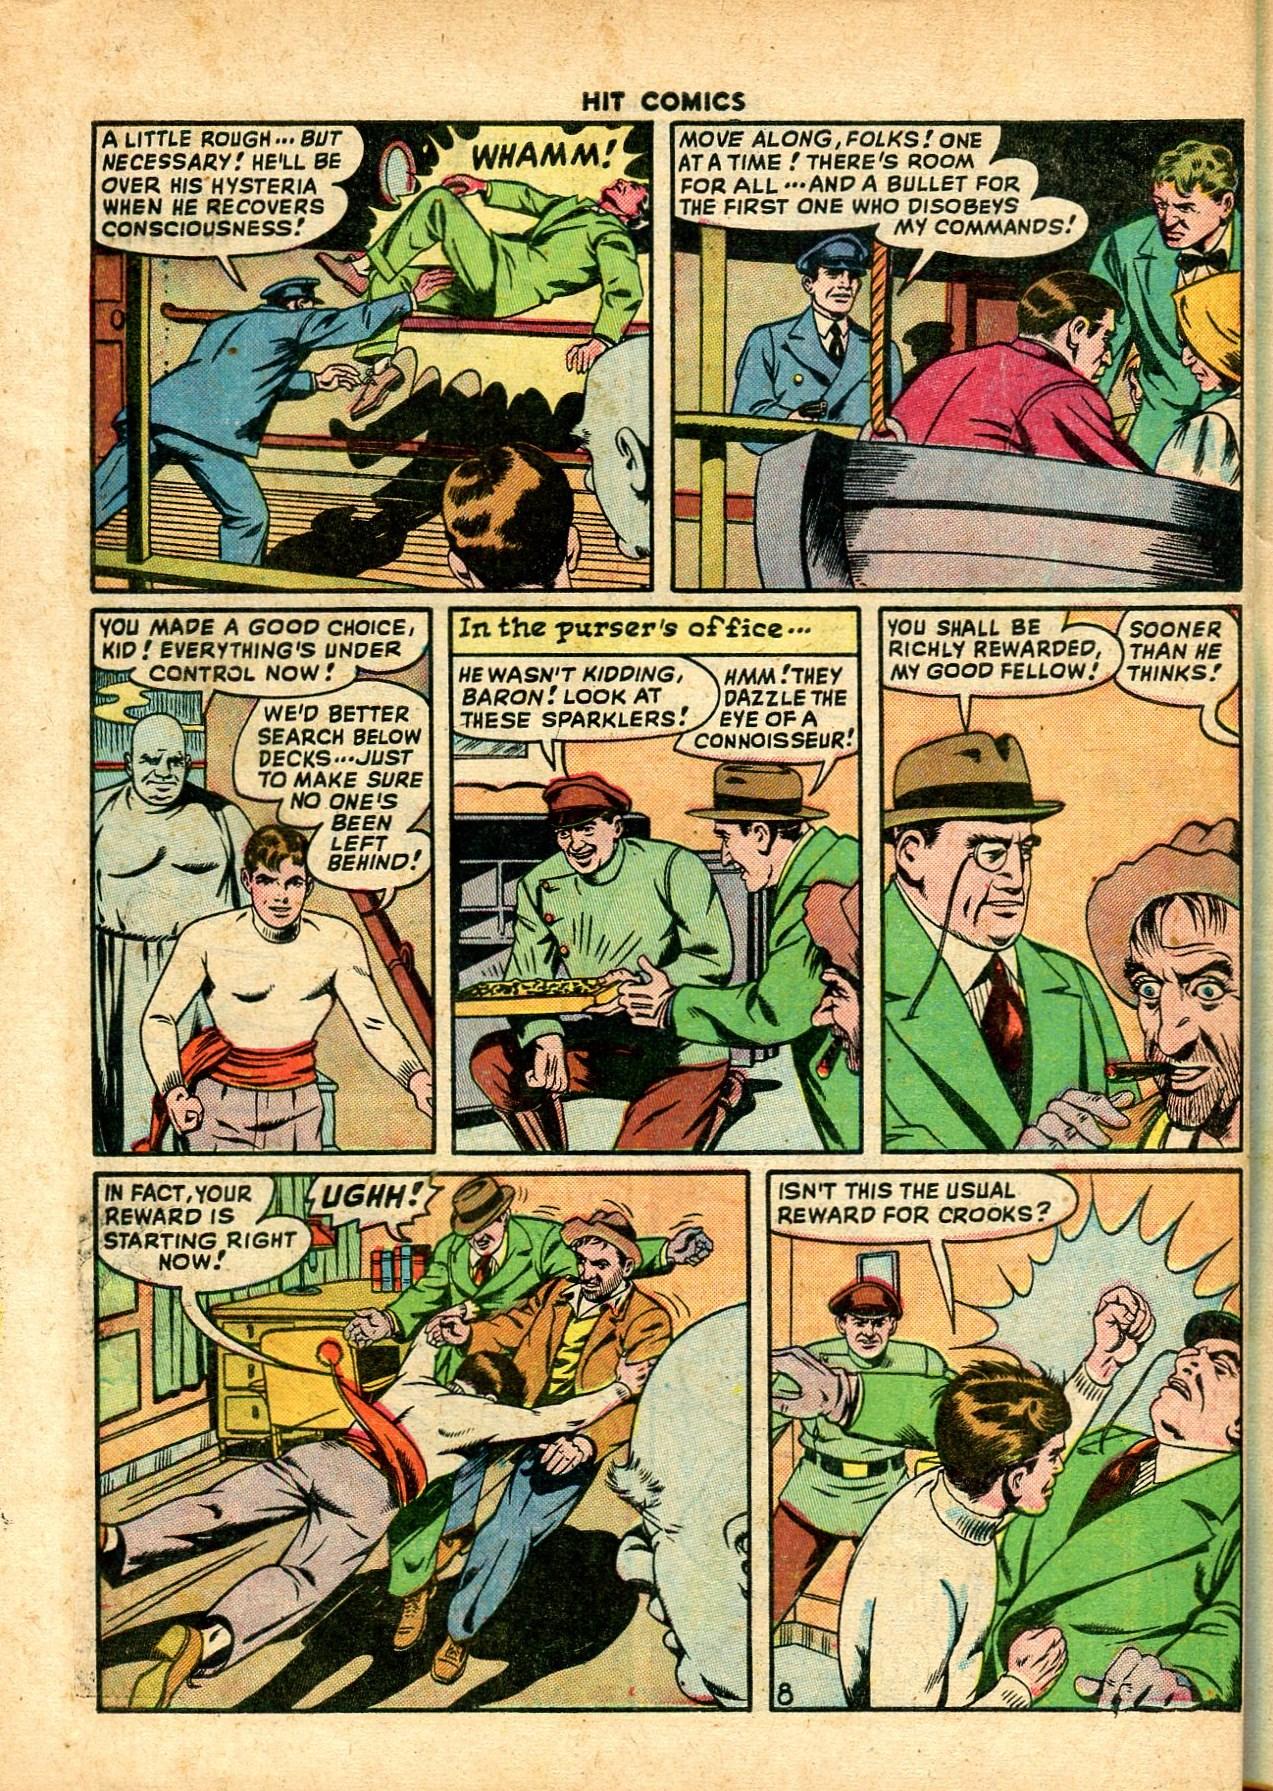 Read online Hit Comics comic -  Issue #59 - 10